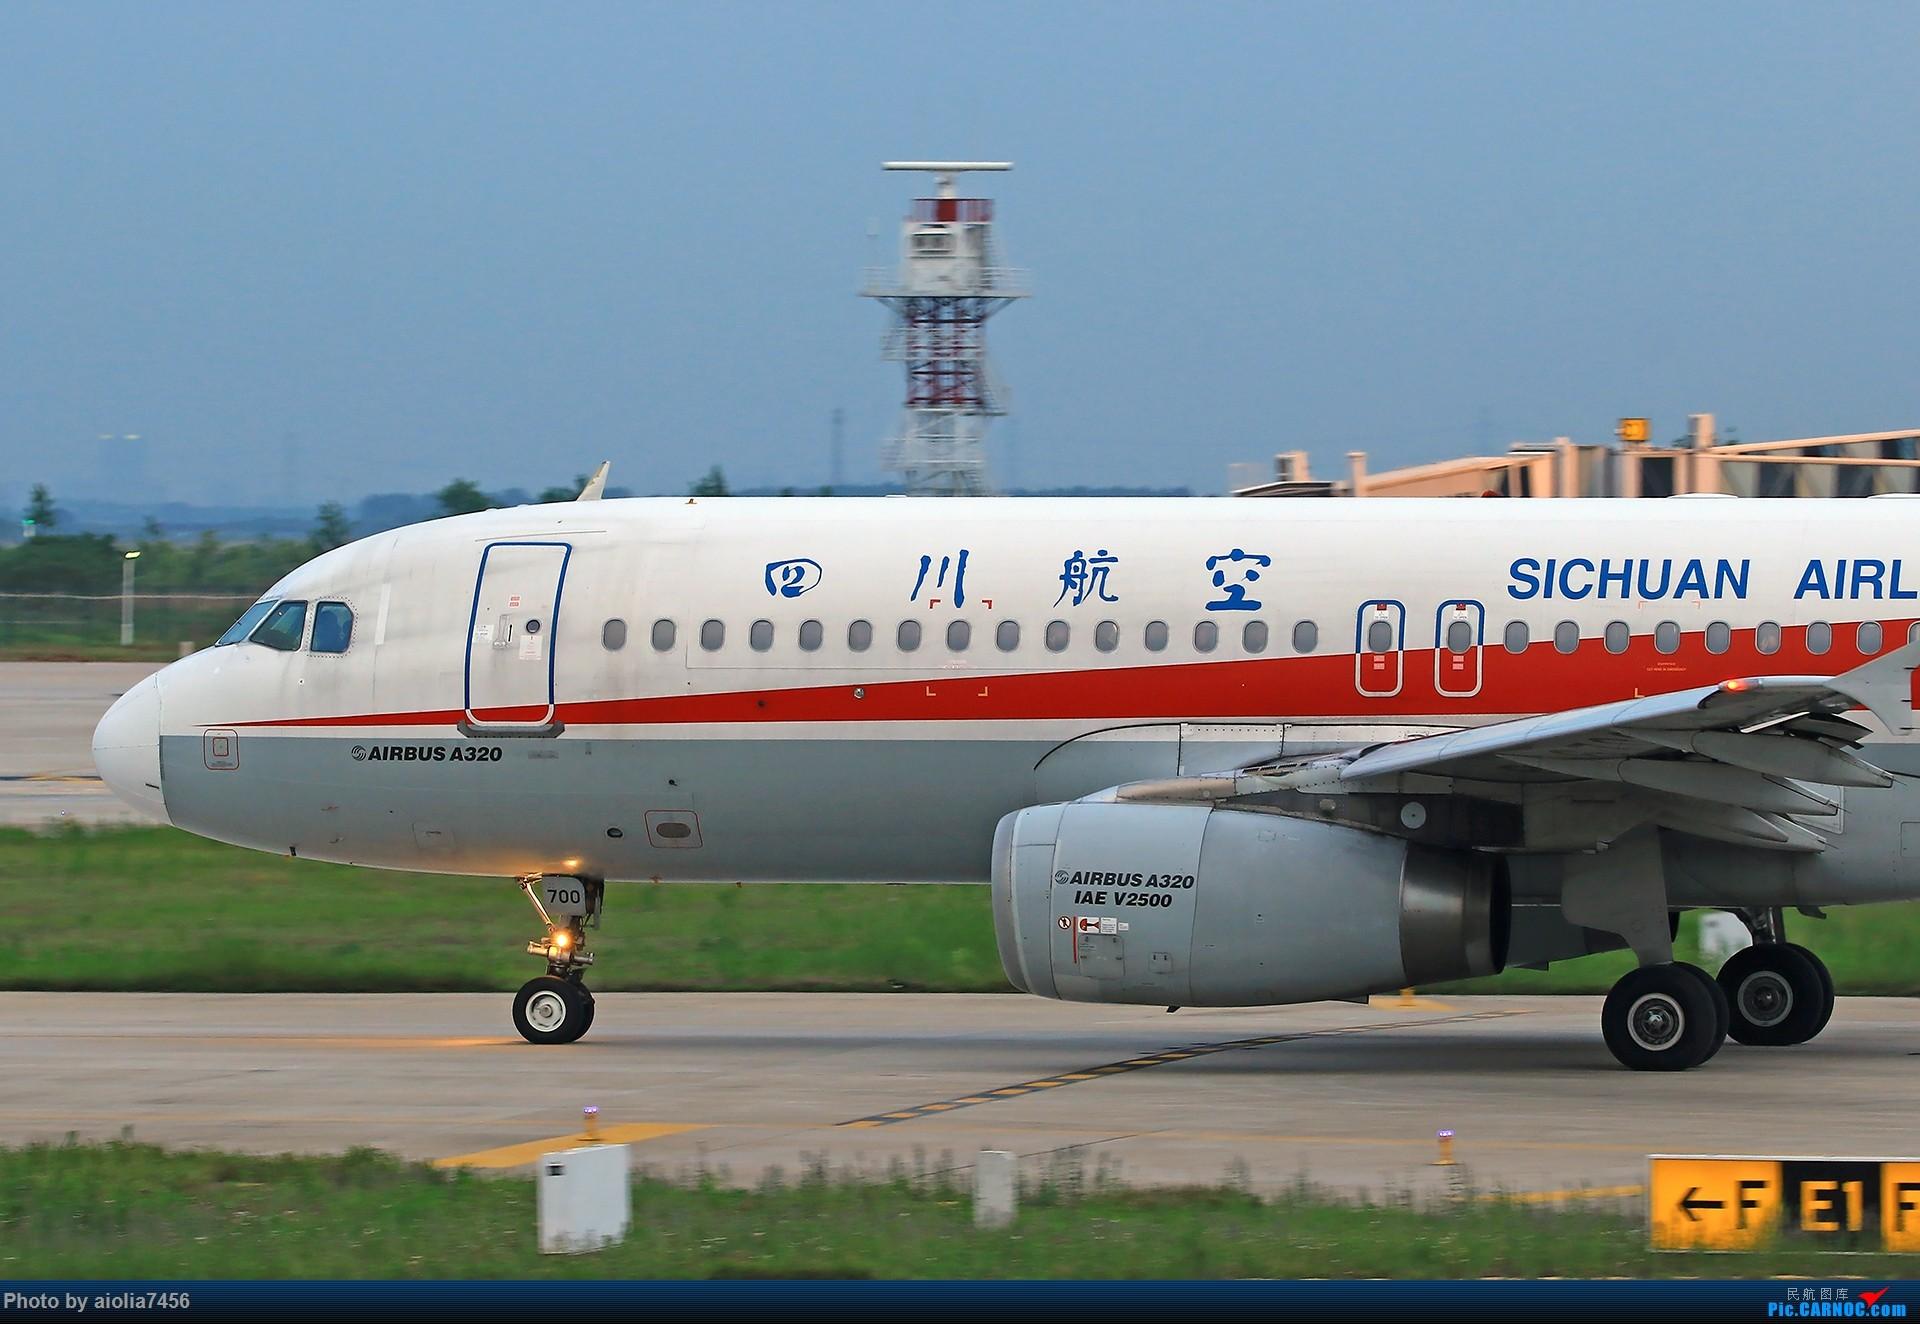 Re:[原创][合肥飞友会]霸都打鸡 找个机会白天打华航 顺便看看期待已久的迪斯尼 AIRBUS A320-200 B-6700 中国合肥新桥国际机场